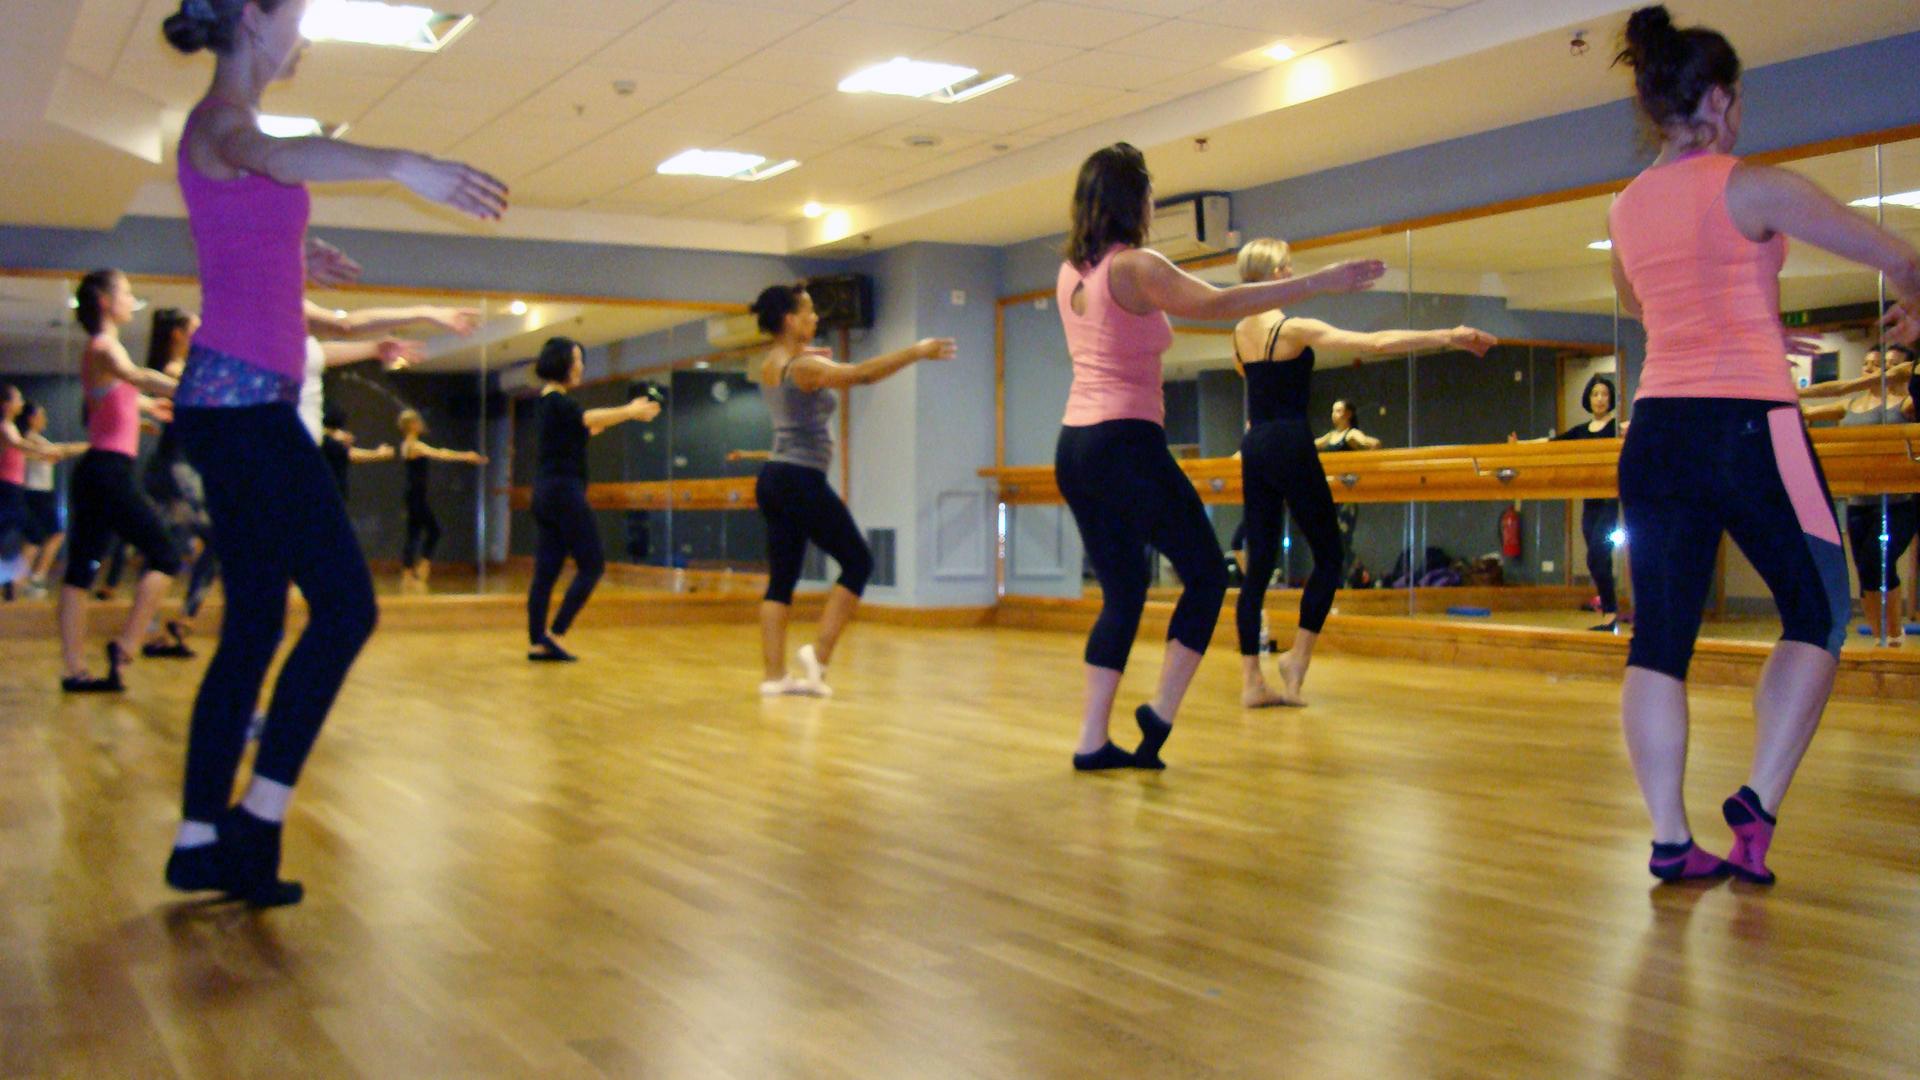 Copy of ballet body sculpture ballet fitness classes